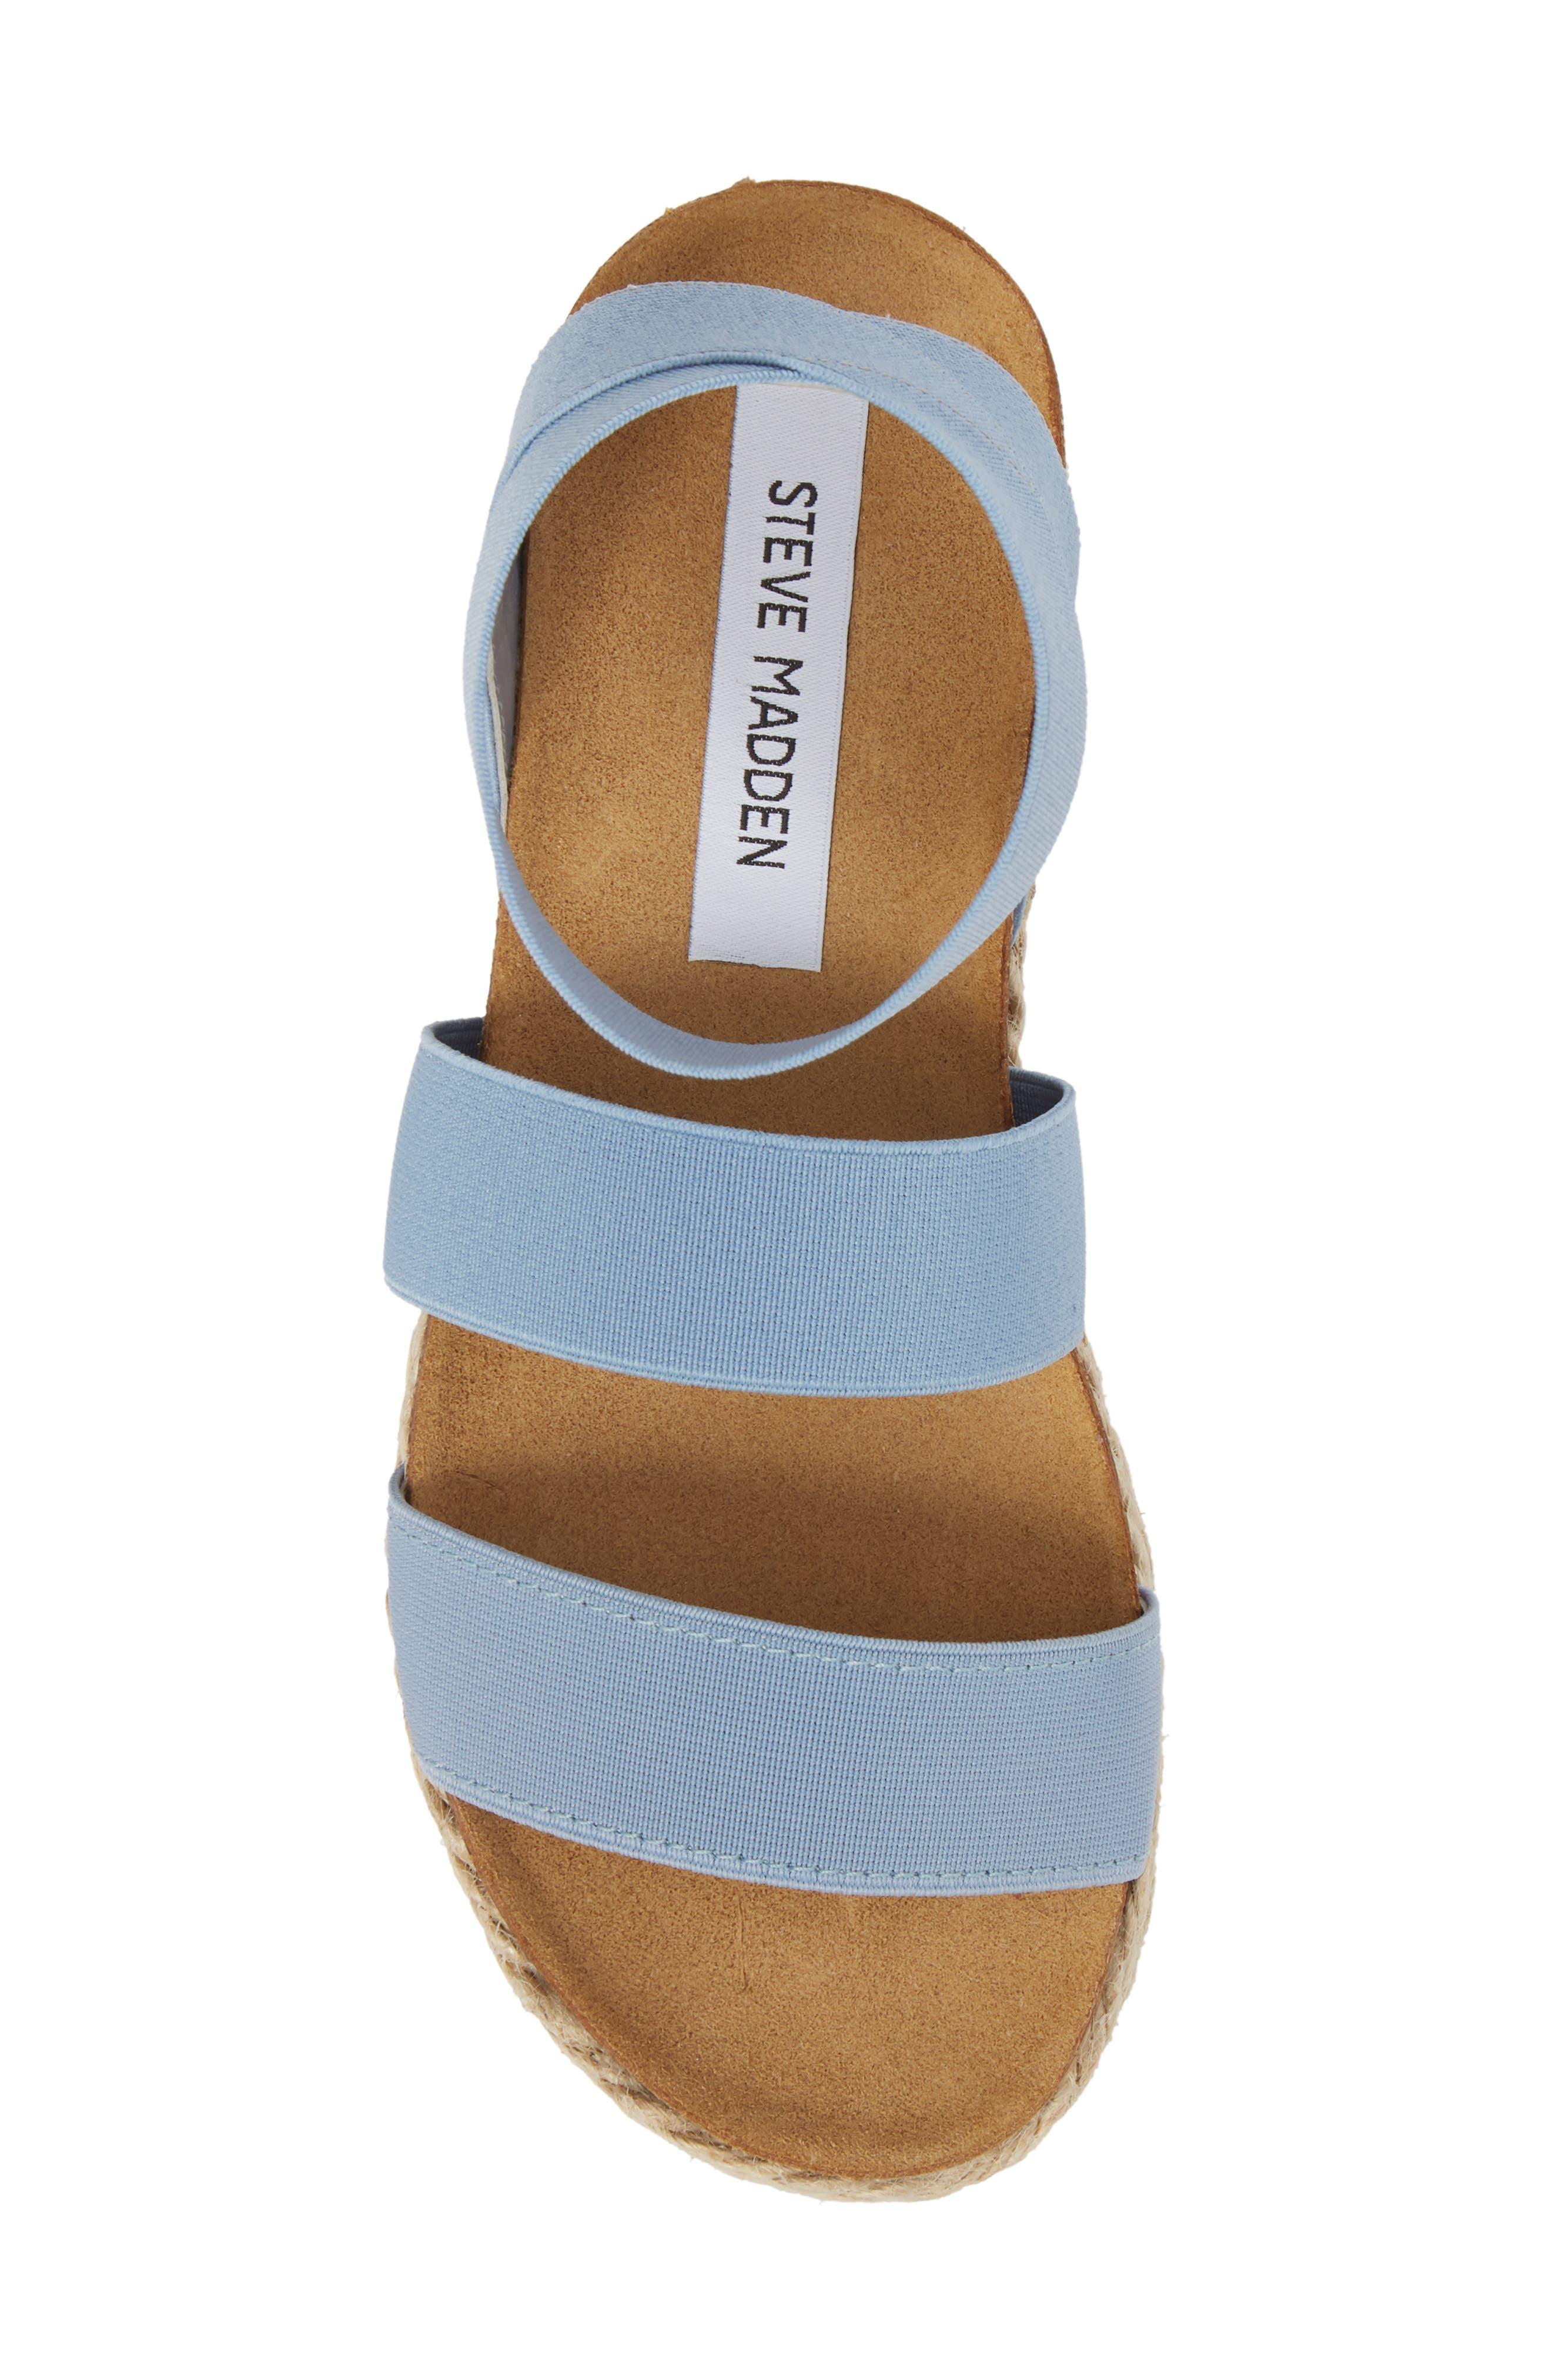 Kimmie Flatform Sandal,                             Alternate thumbnail 14, color,